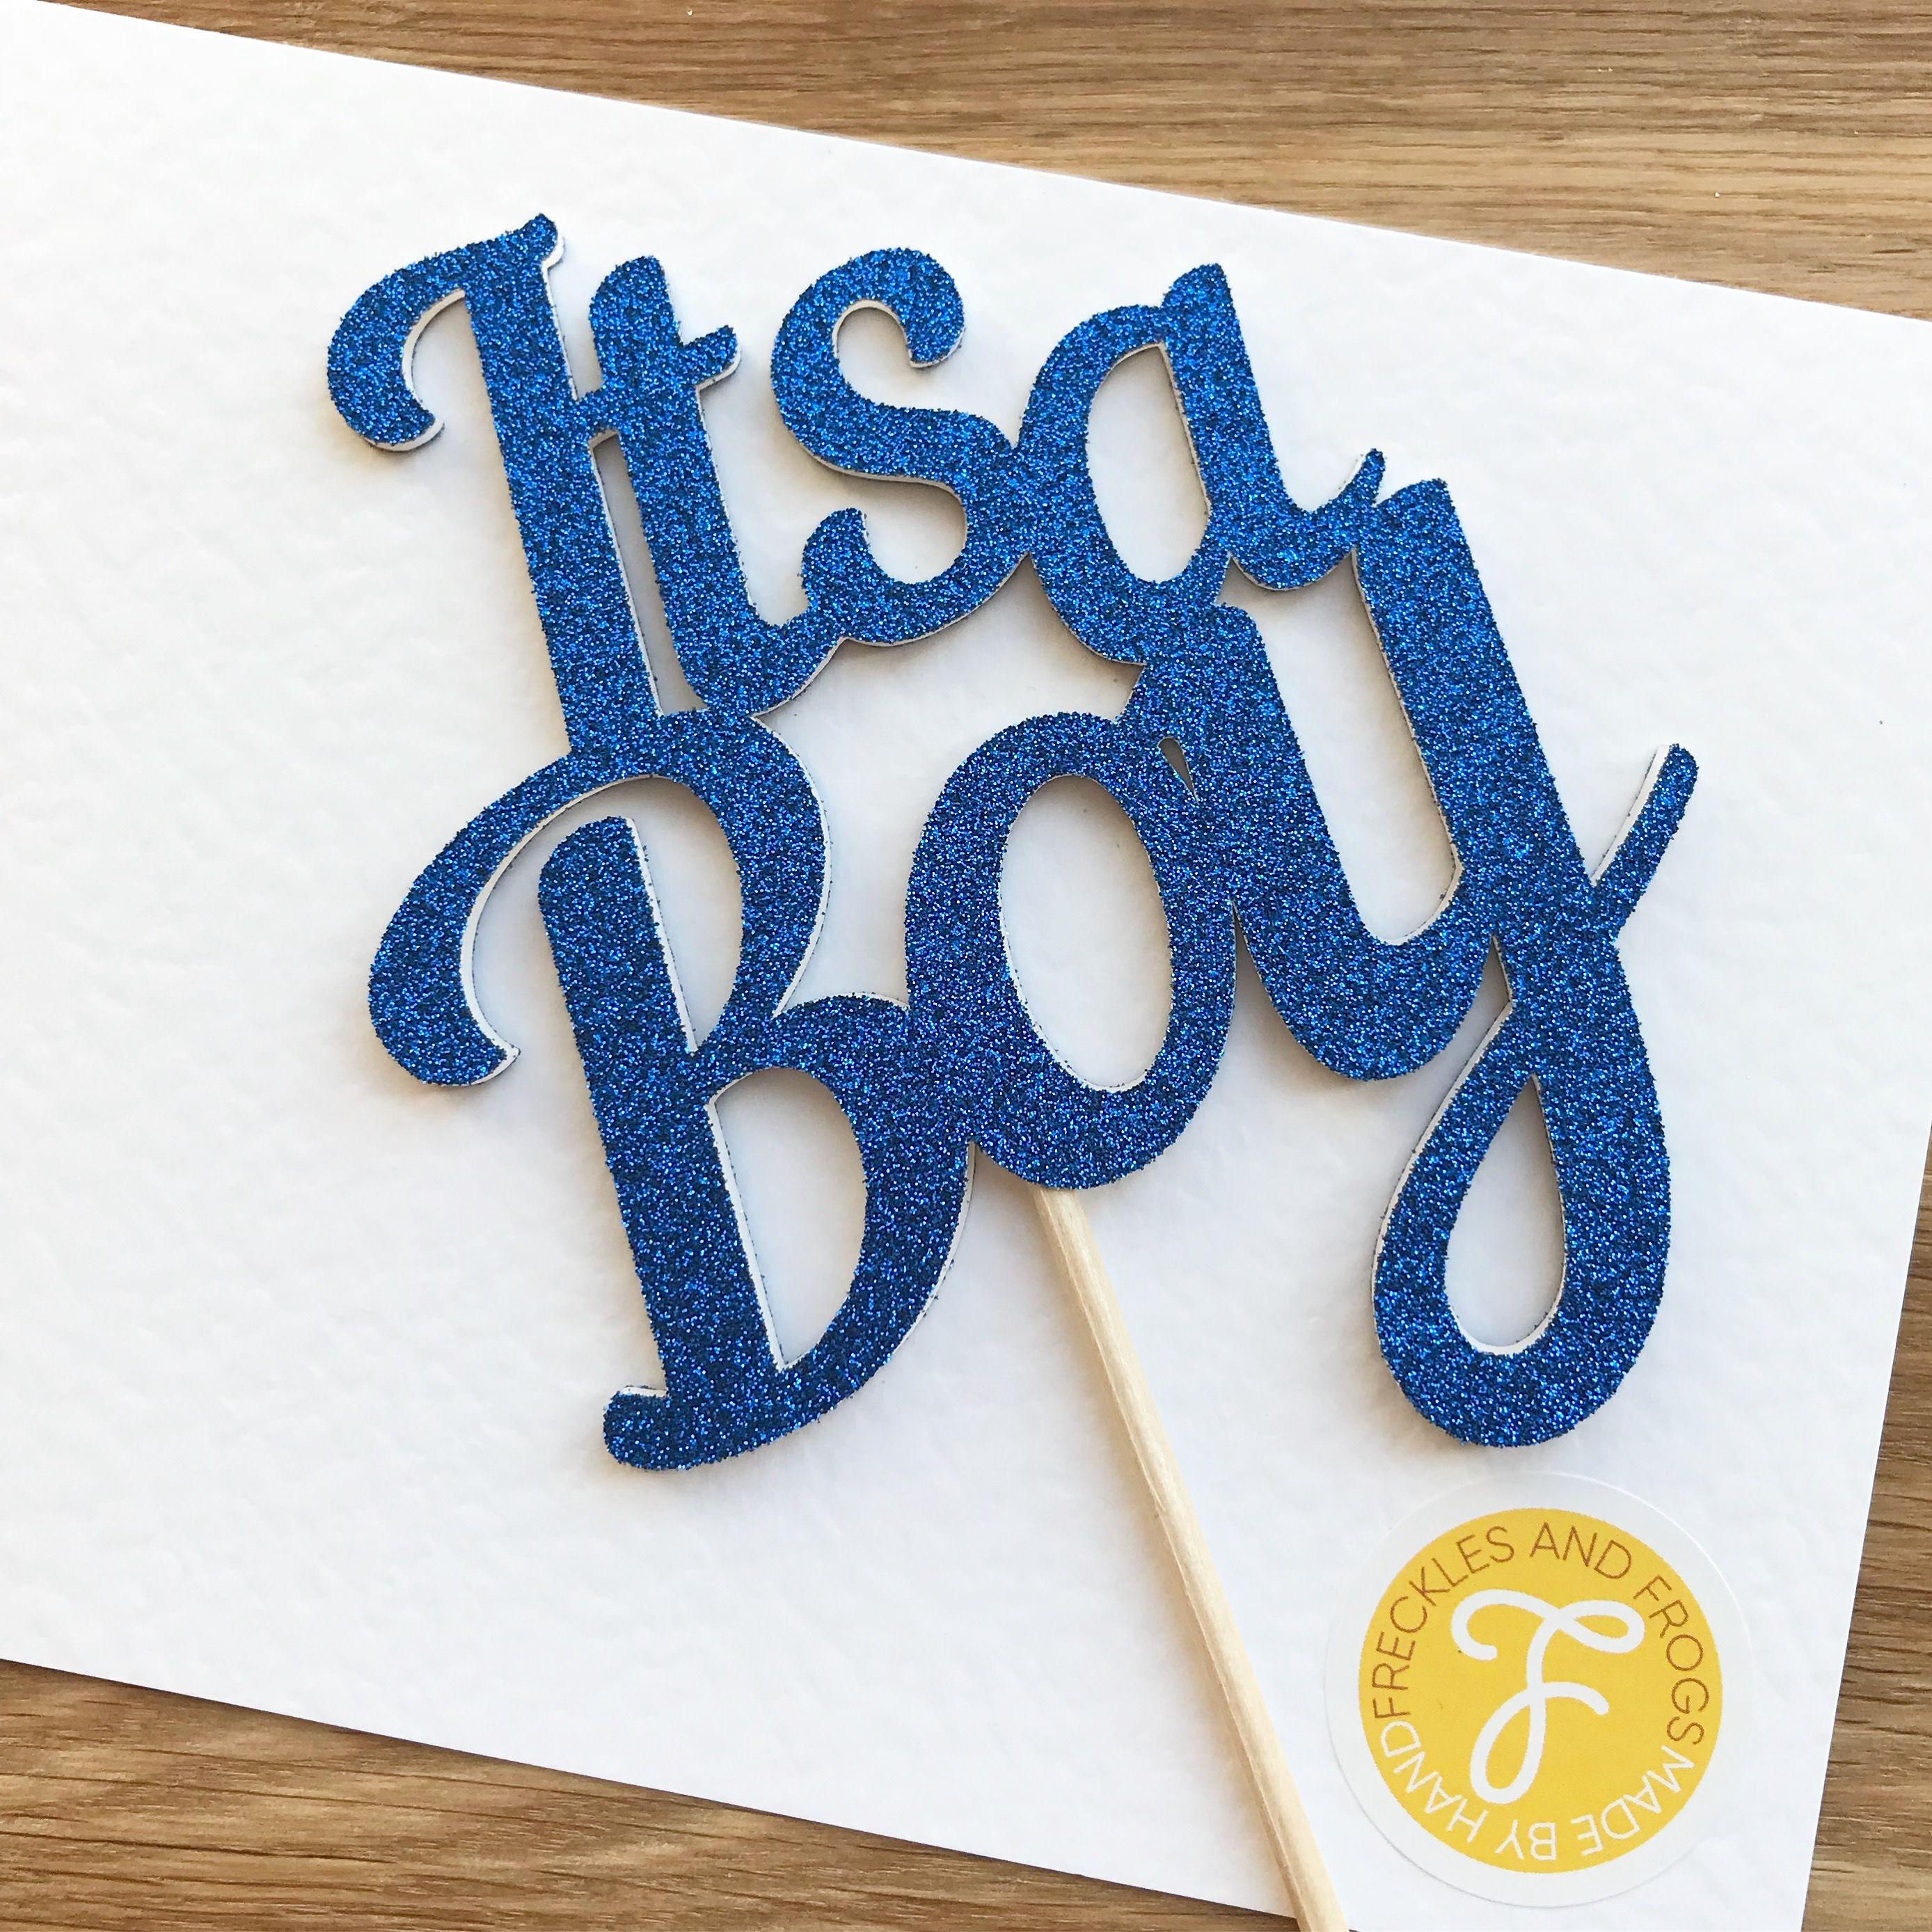 Its A Boy Cake Topper Glitter Blue Baby Shower Baby Boy Cake Decorations Baby Shower Decorations By Baby Boy Cakes Diy Baby Stuff Happy Birthday Font